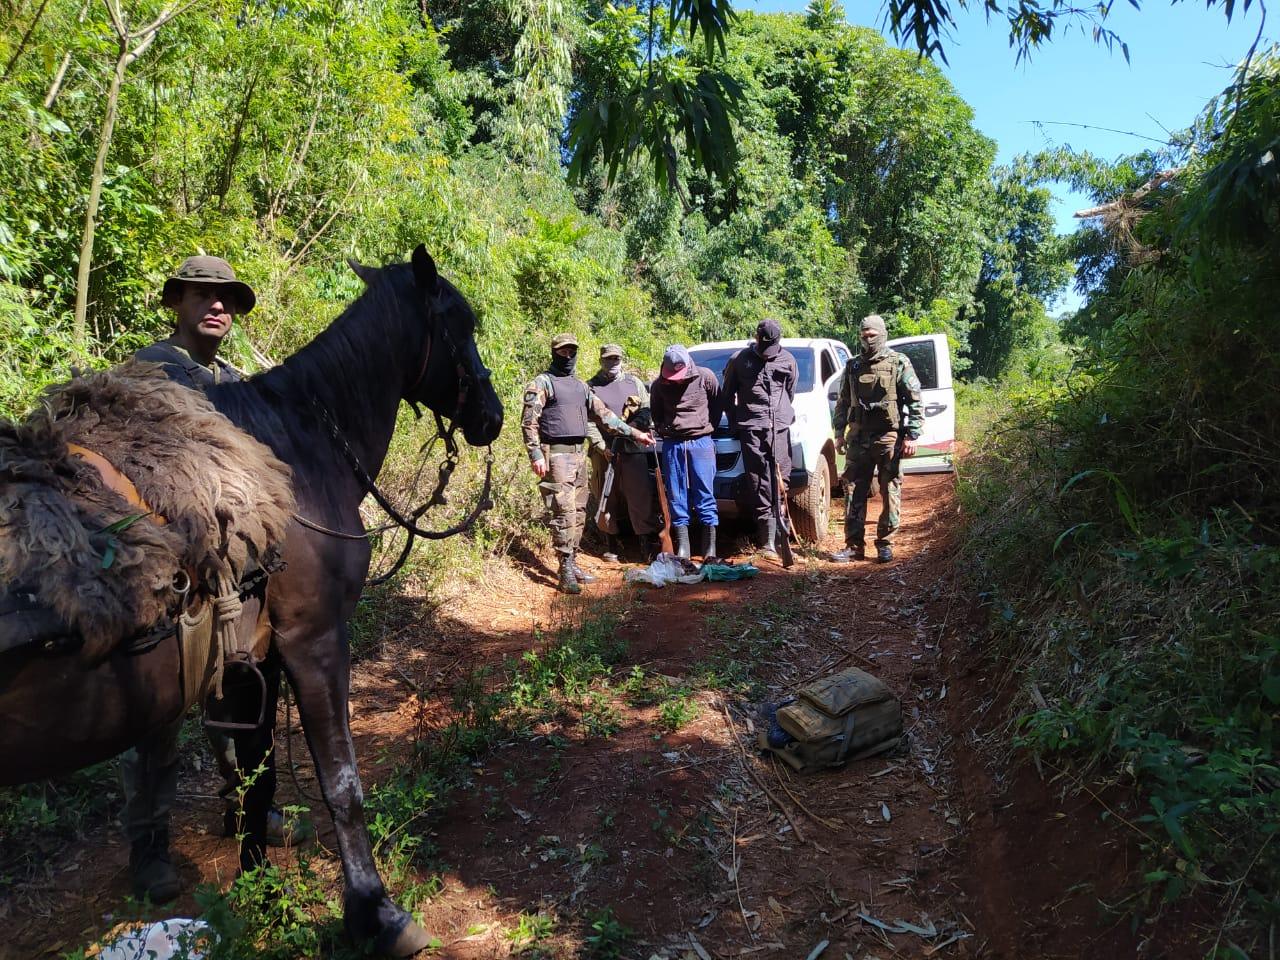 Guardaparques del GOS detienen a dos cazadores furtivos brasileños